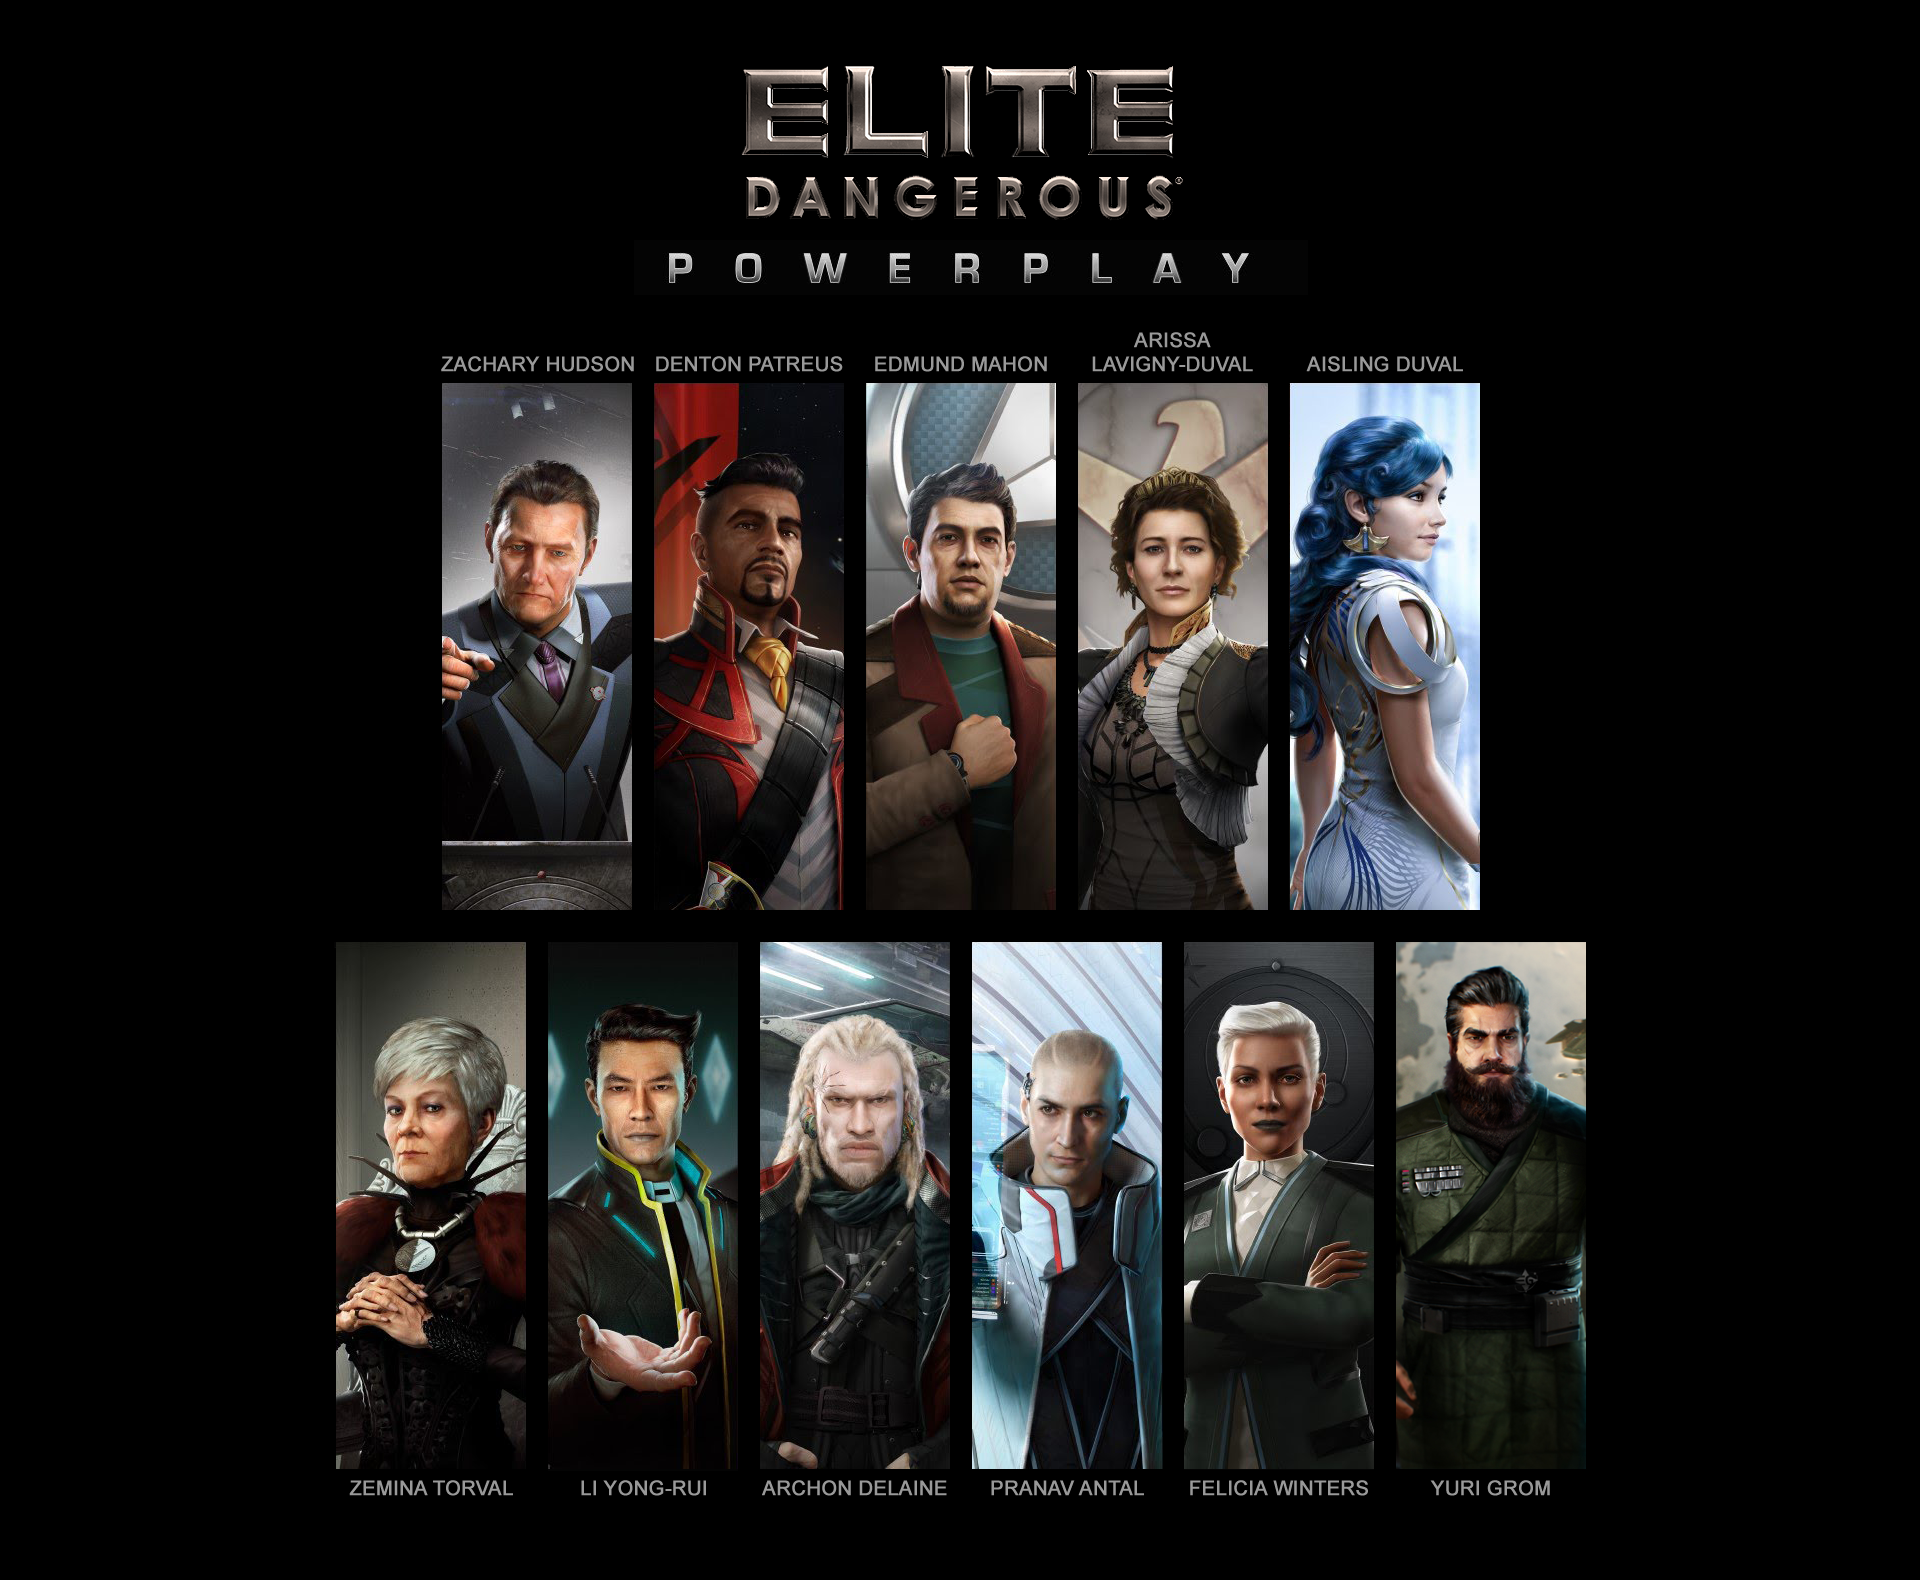 powerplay elite dangerous wiki fandom powered by wikia